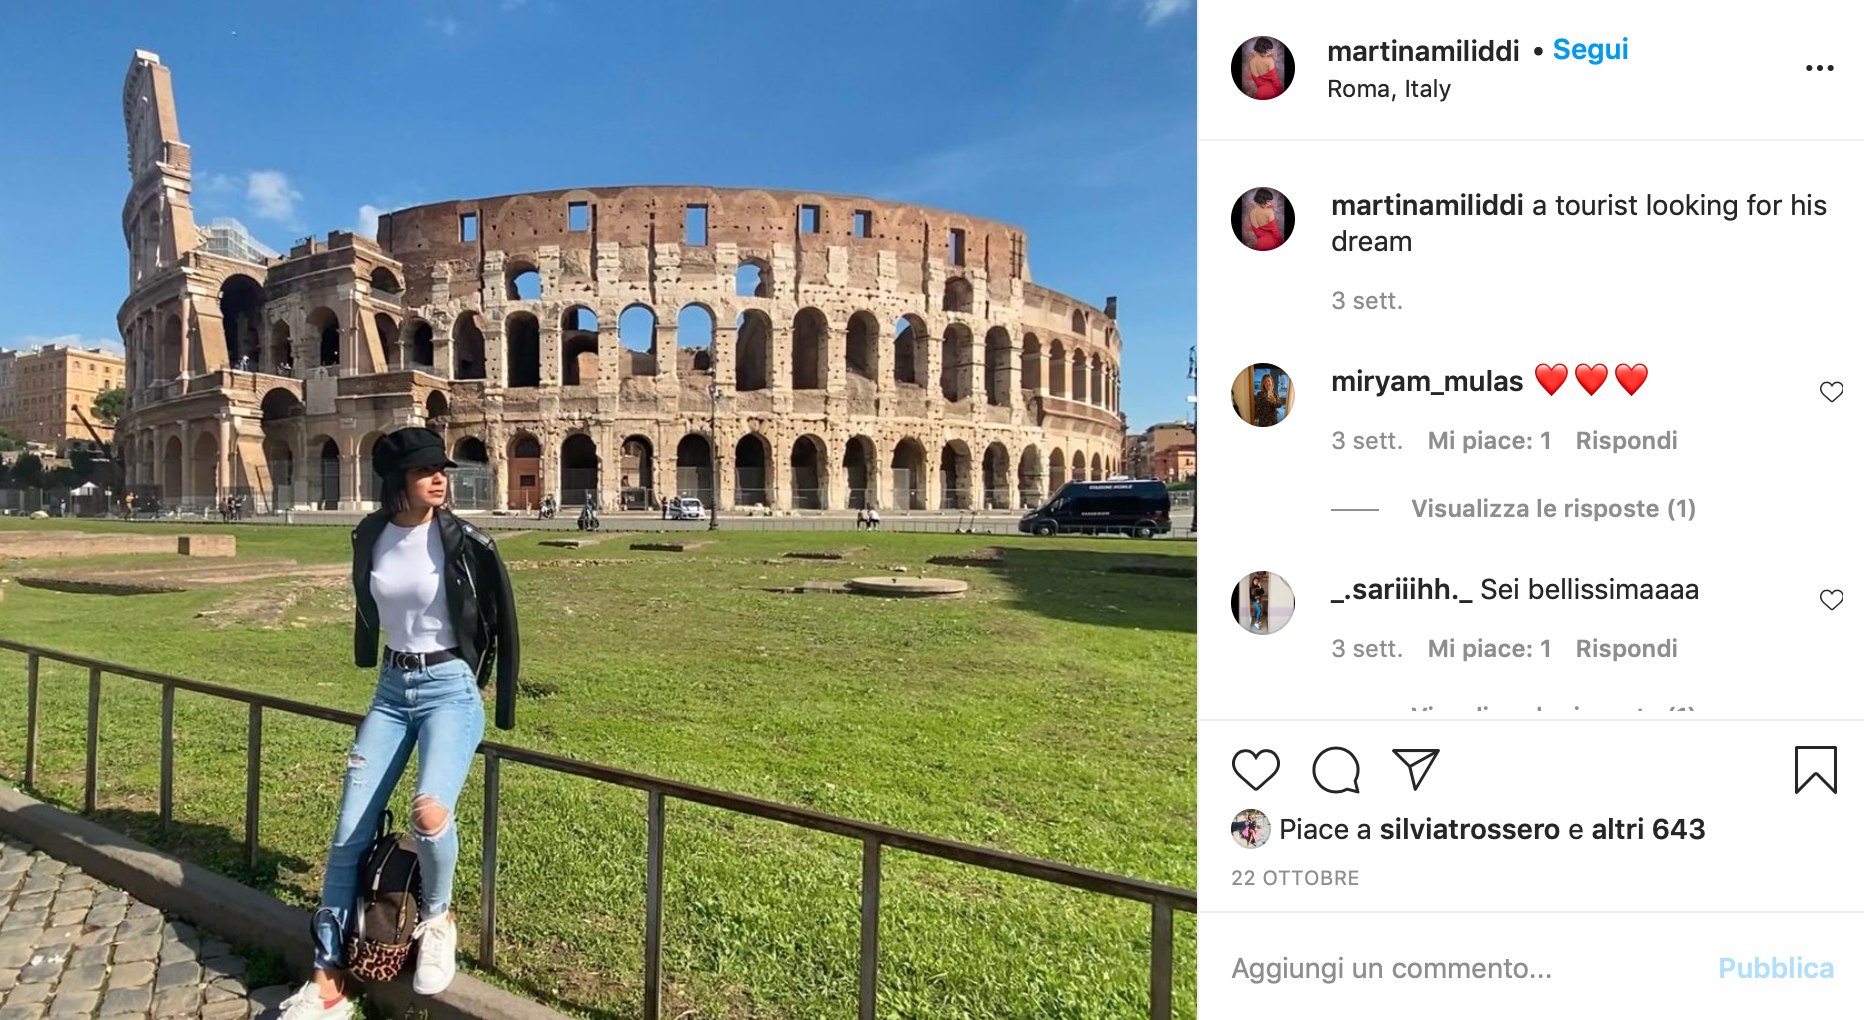 Martina Miliddi instagram